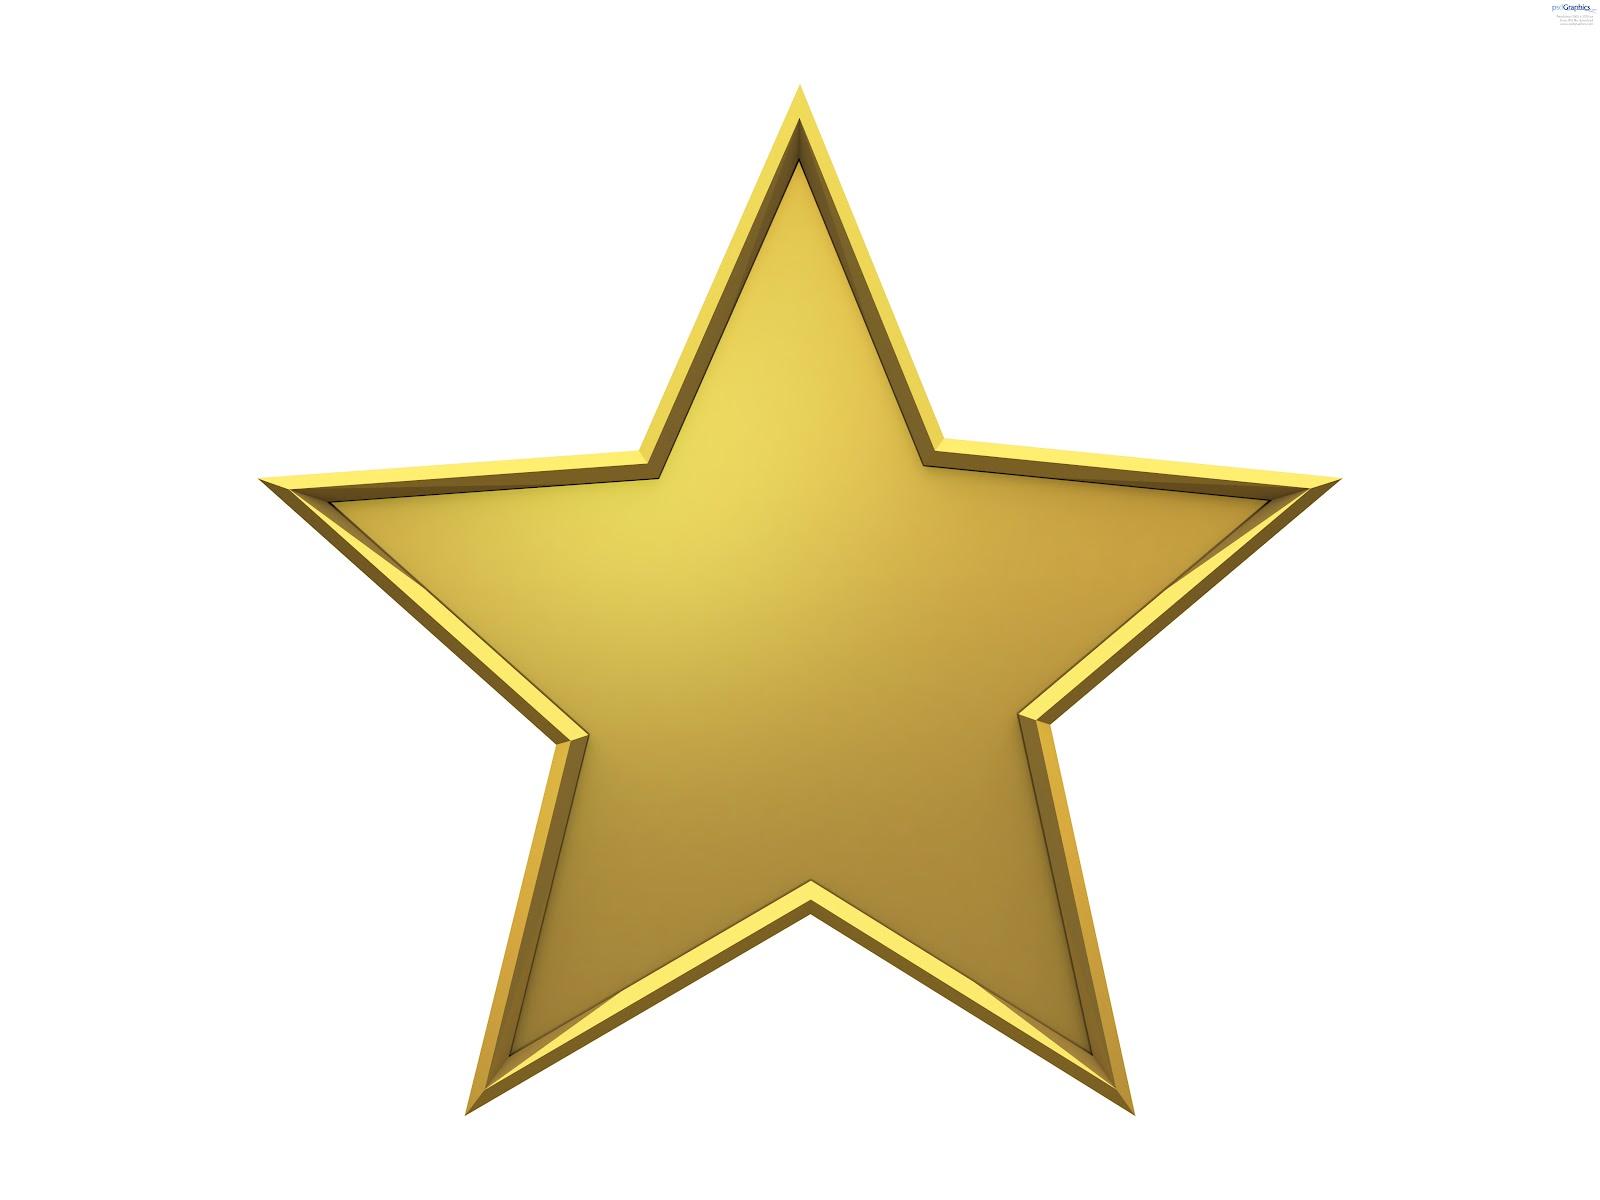 yellow star shape clipart best star shape clip art happy star shaped clip art